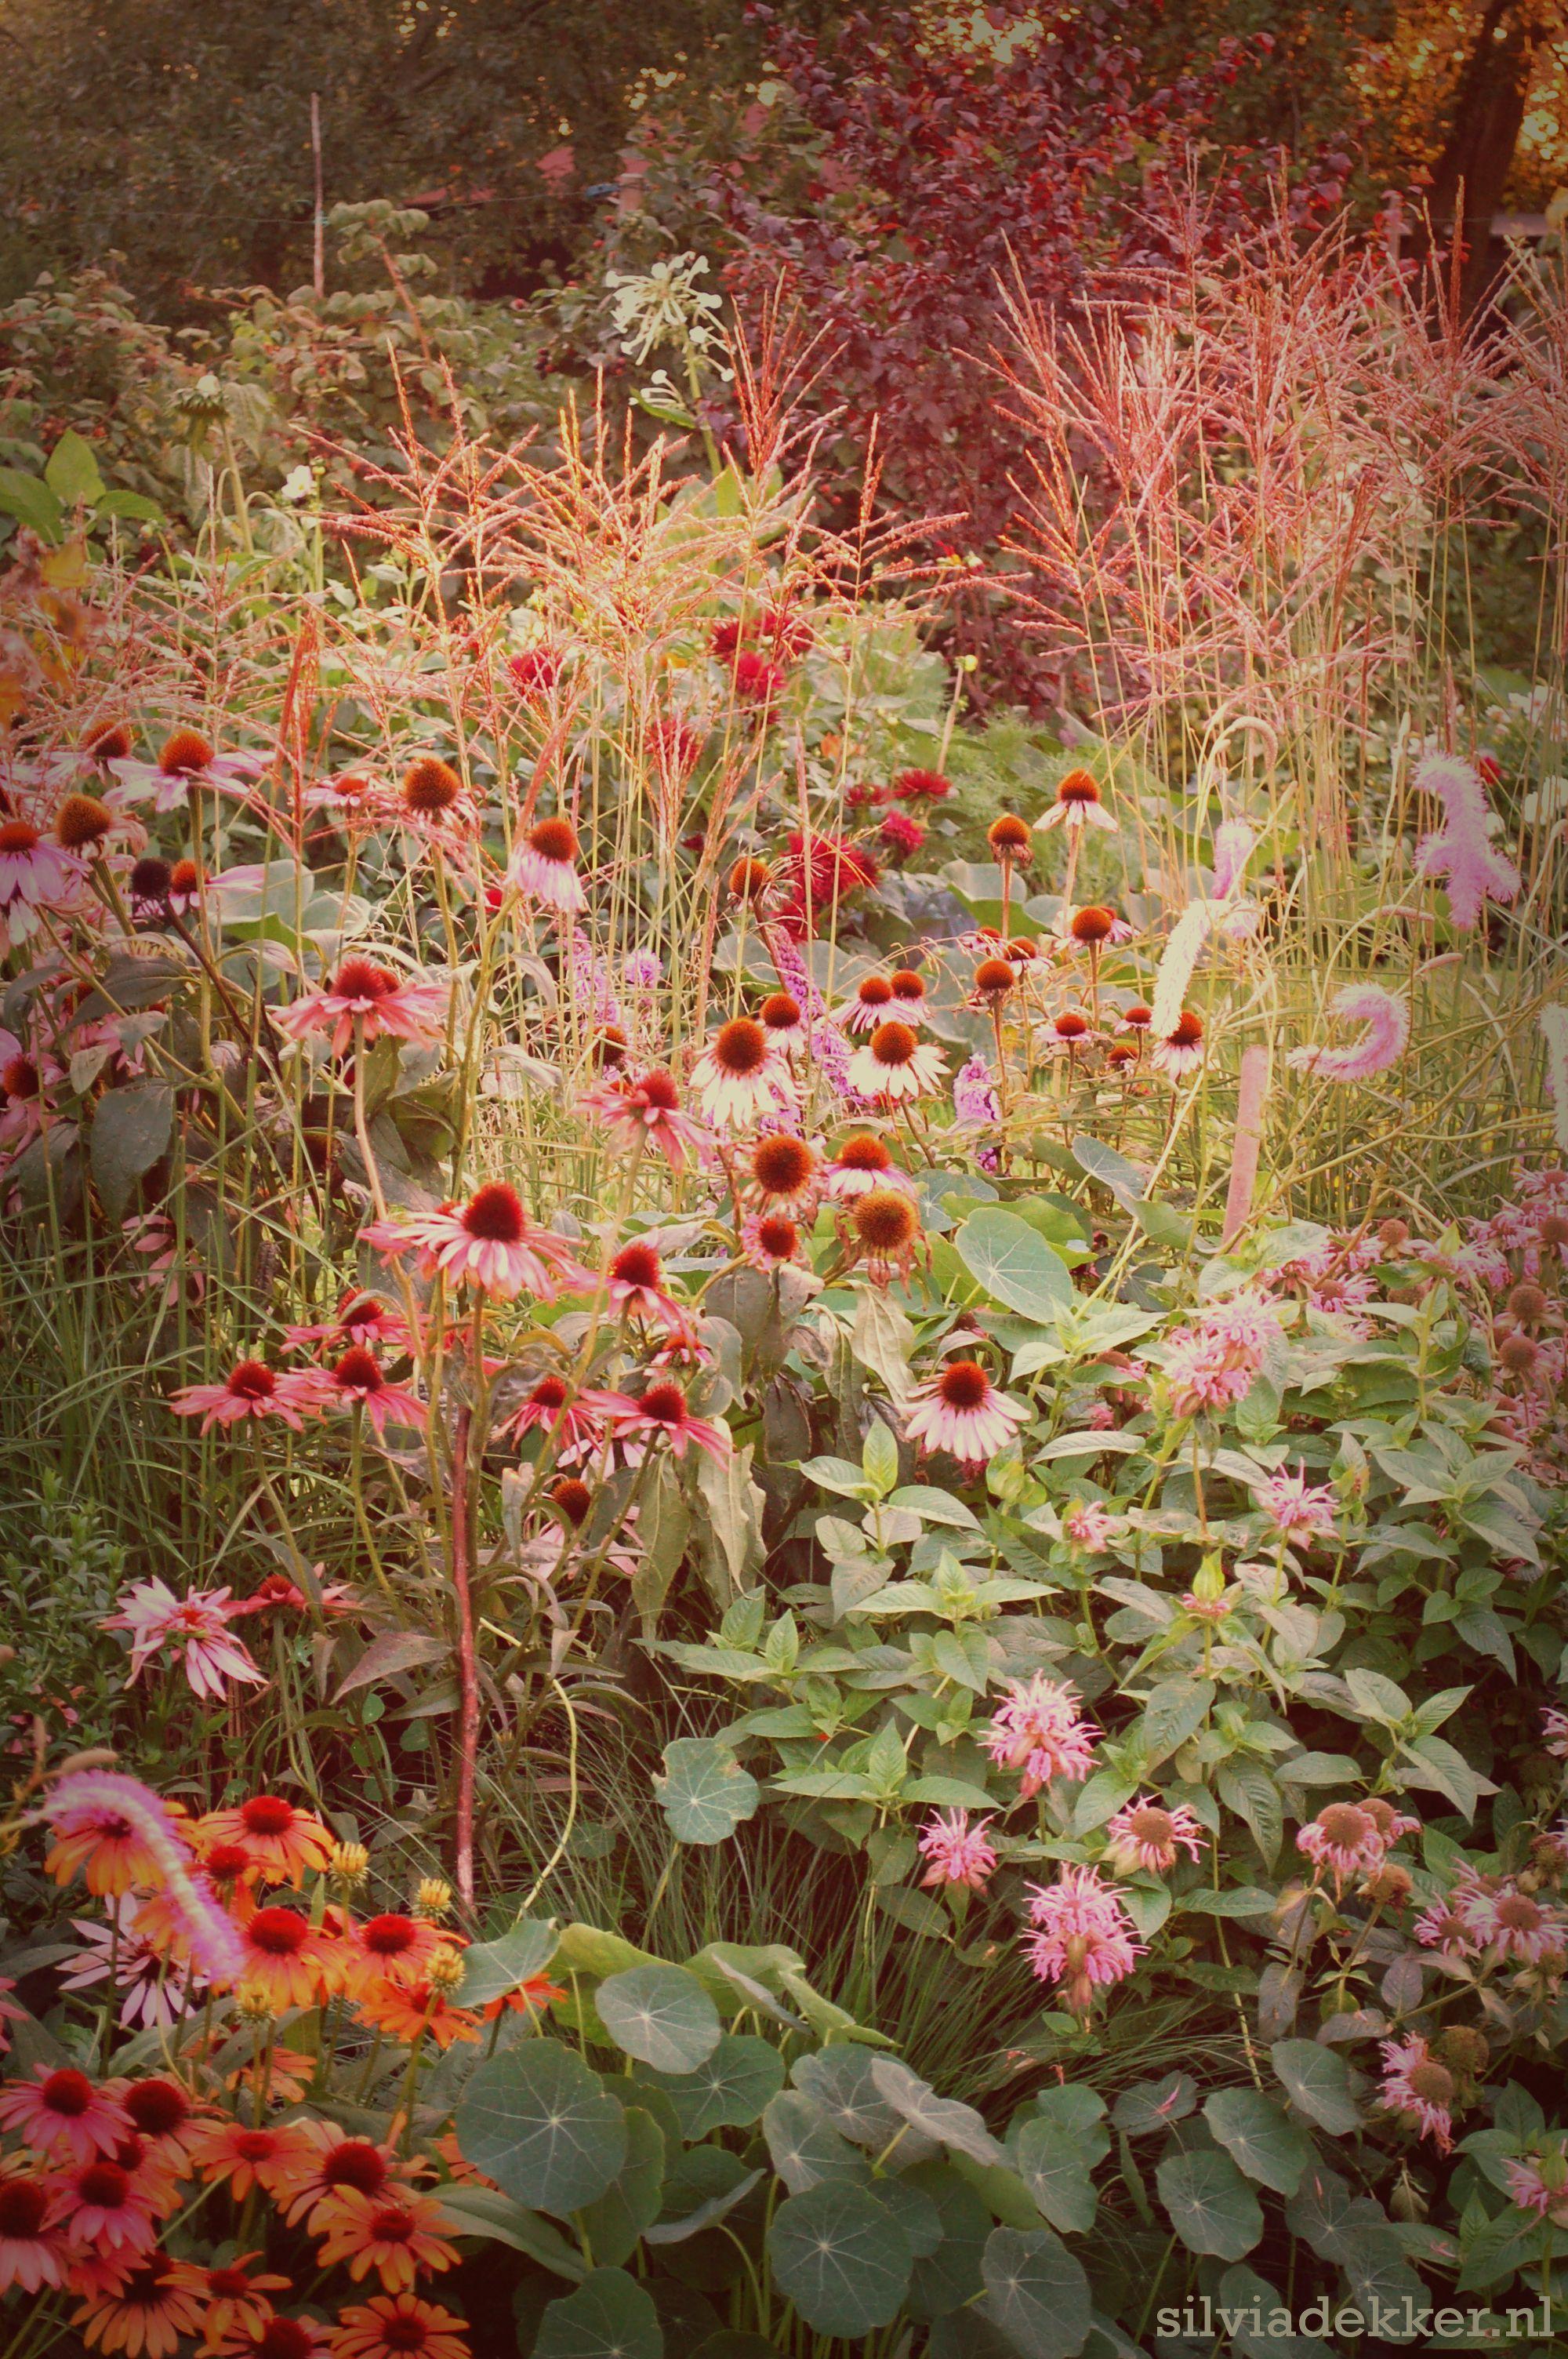 Pin By Ina On Landscaping Ideas Prairie Garden Plants Garden Design